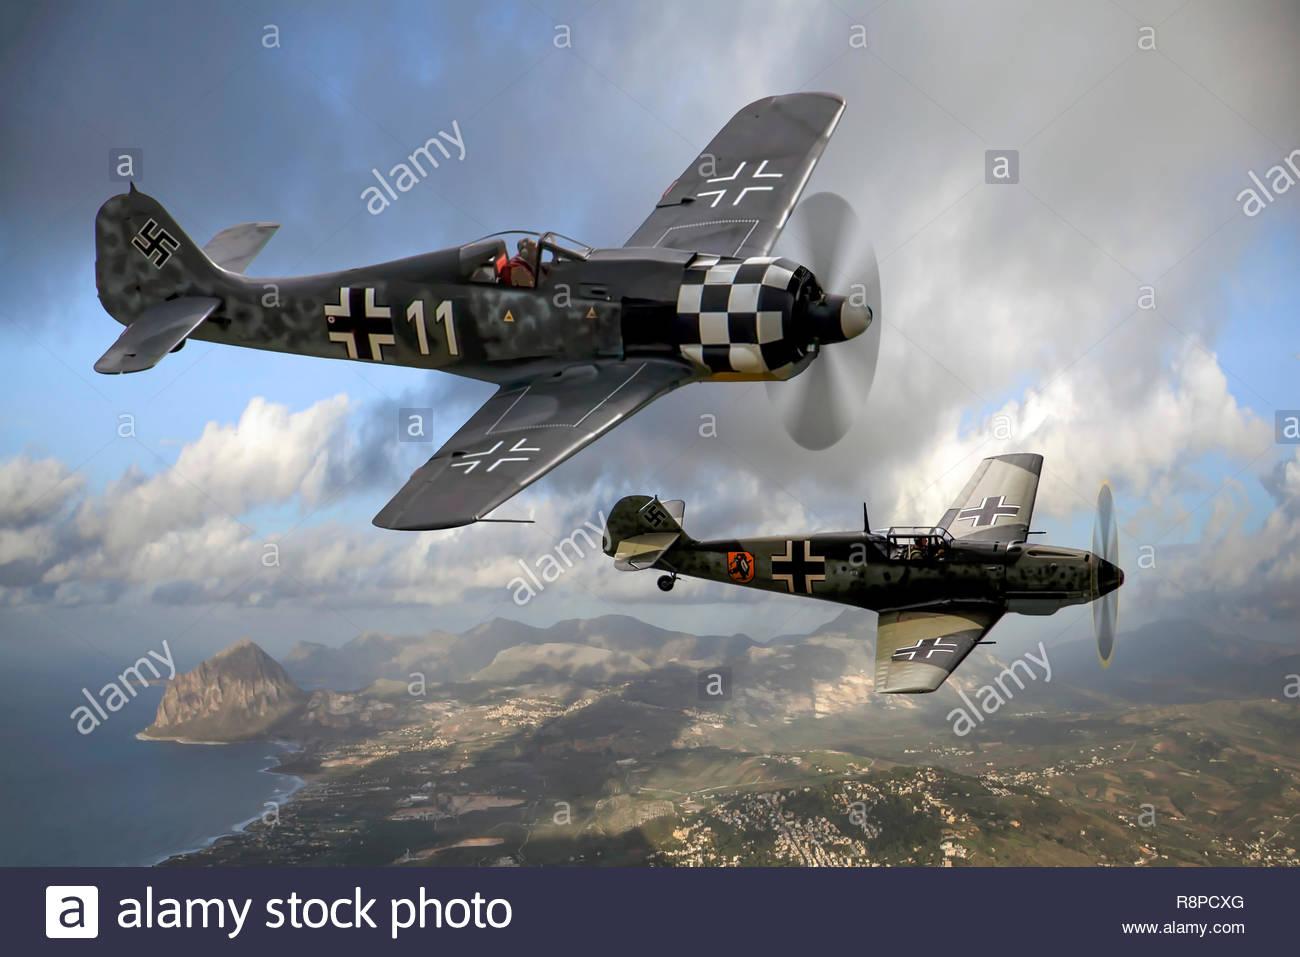 Focke-Wulf FW190 and Messerschmitt Bf 109E over Sicily - Stock Image